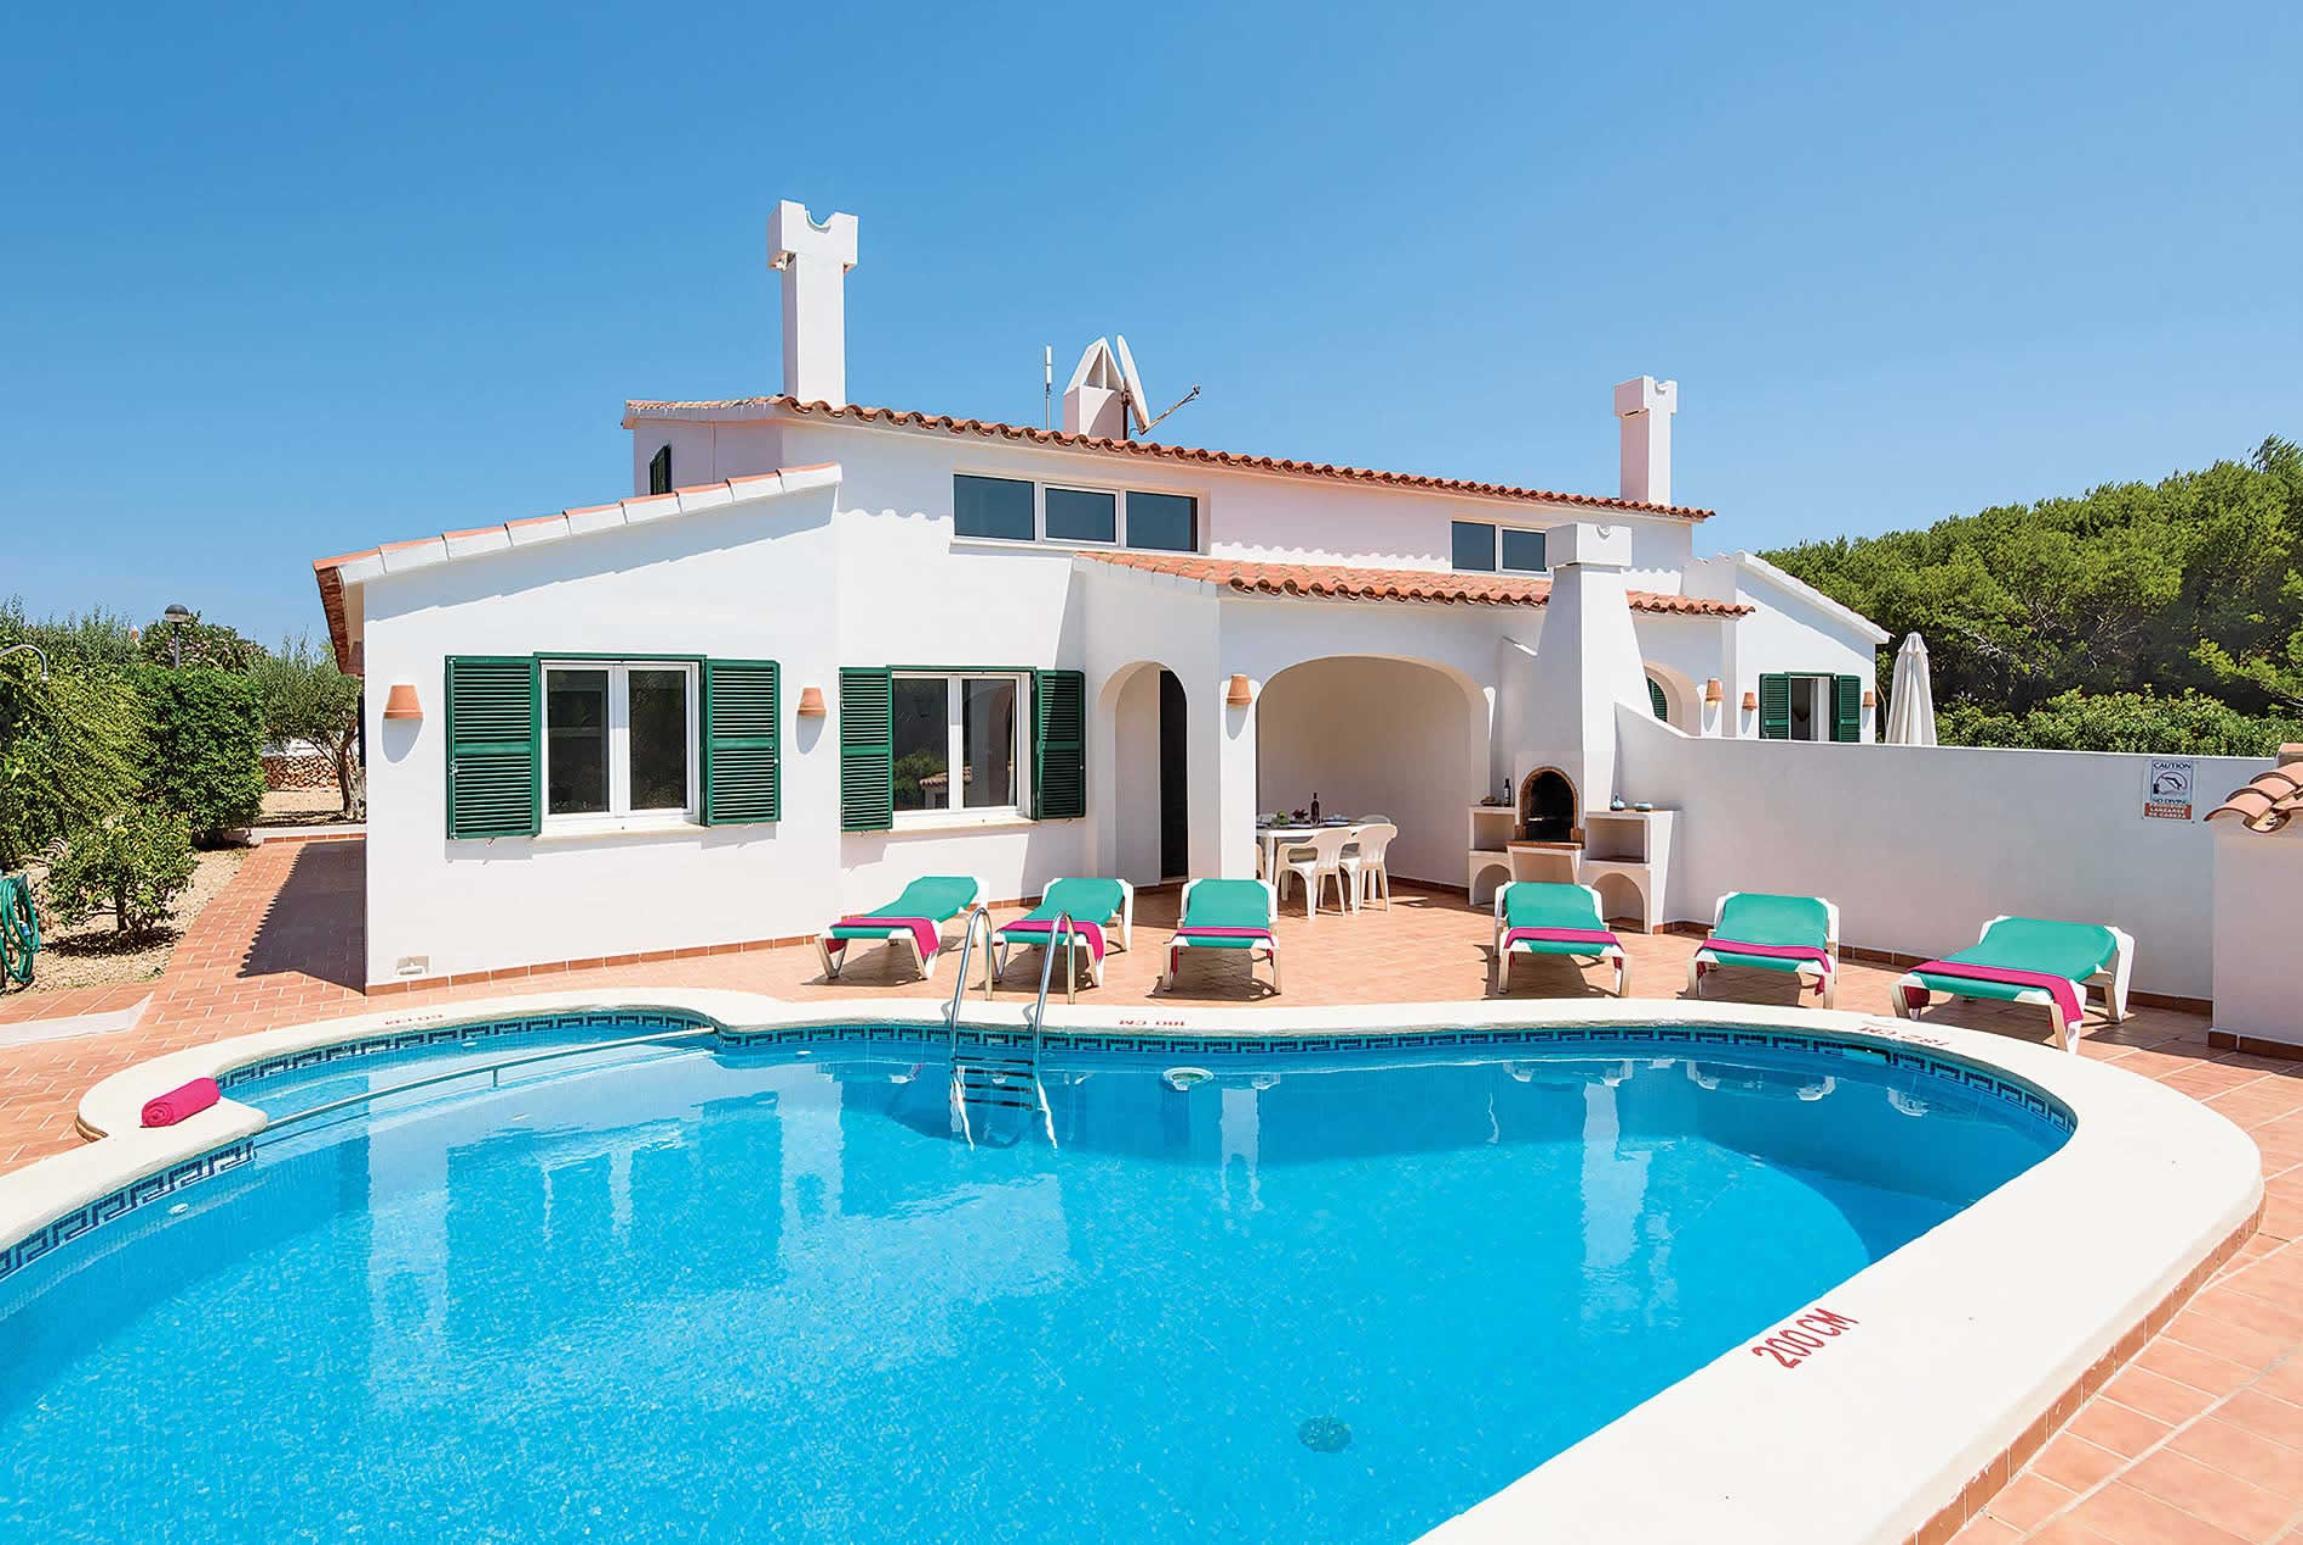 Ferienhaus Eulalia II (2653368), Arenal De'N Castell, Menorca, Balearische Inseln, Spanien, Bild 1